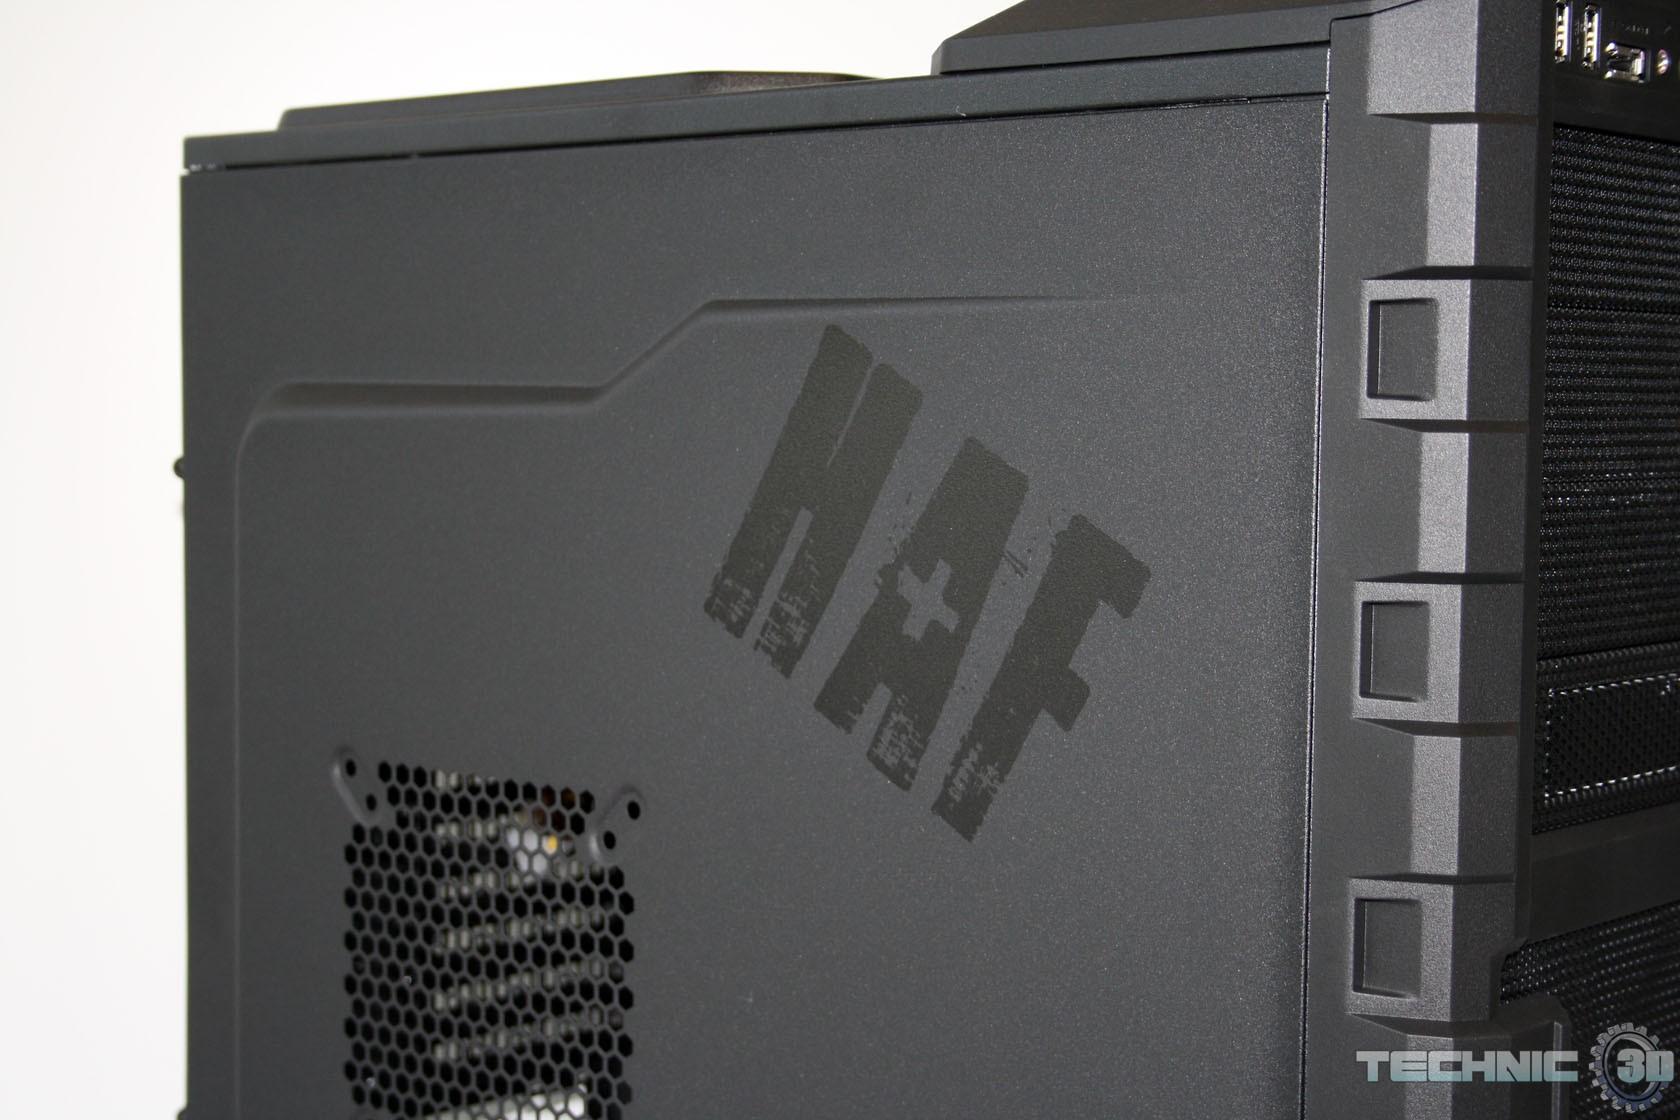 Cooler Master HAF 912 Plus   Review   Technic3D